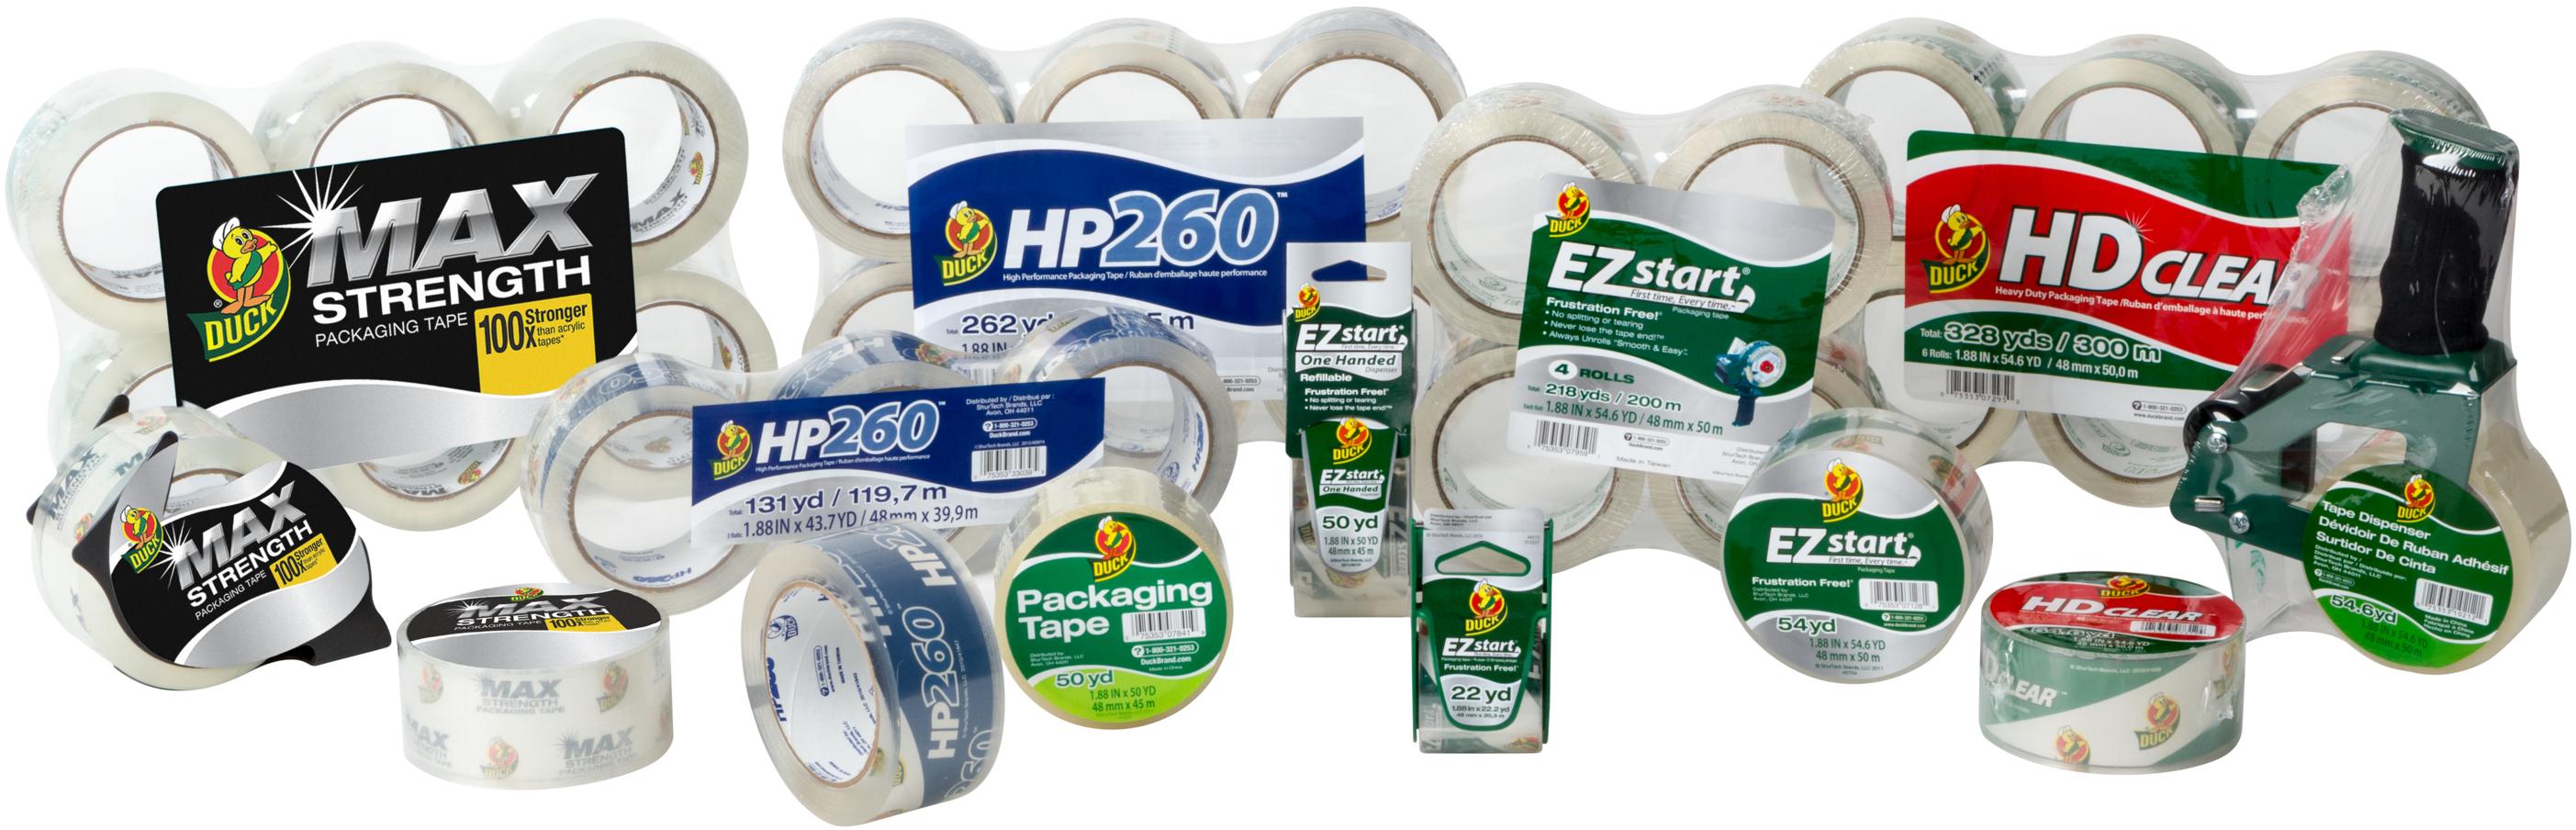 DUCK Brand Packaging Tape